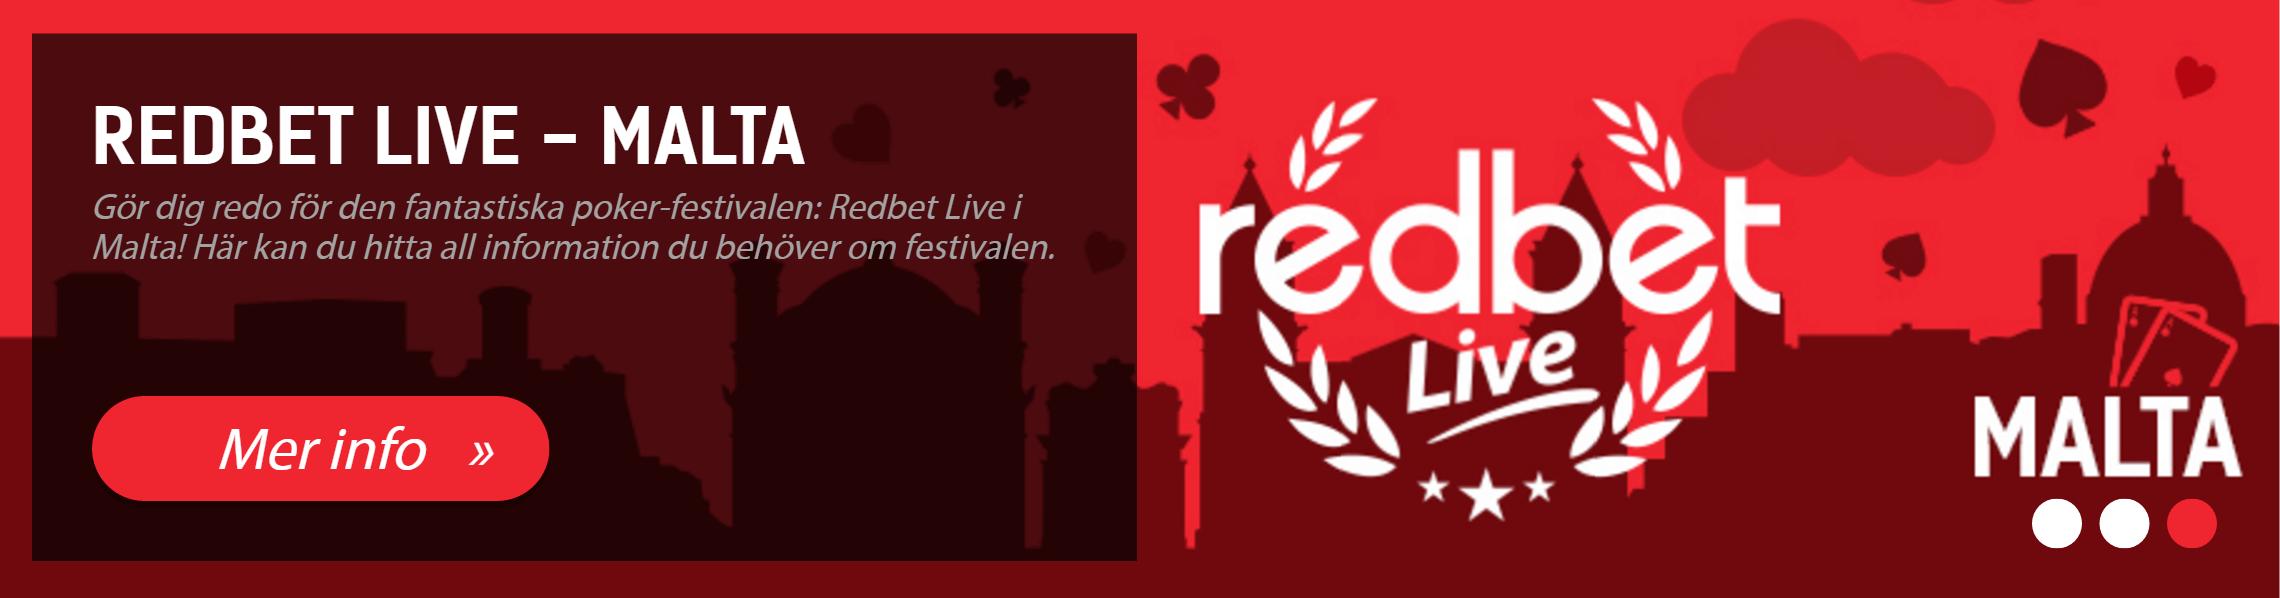 Redbet live Malta